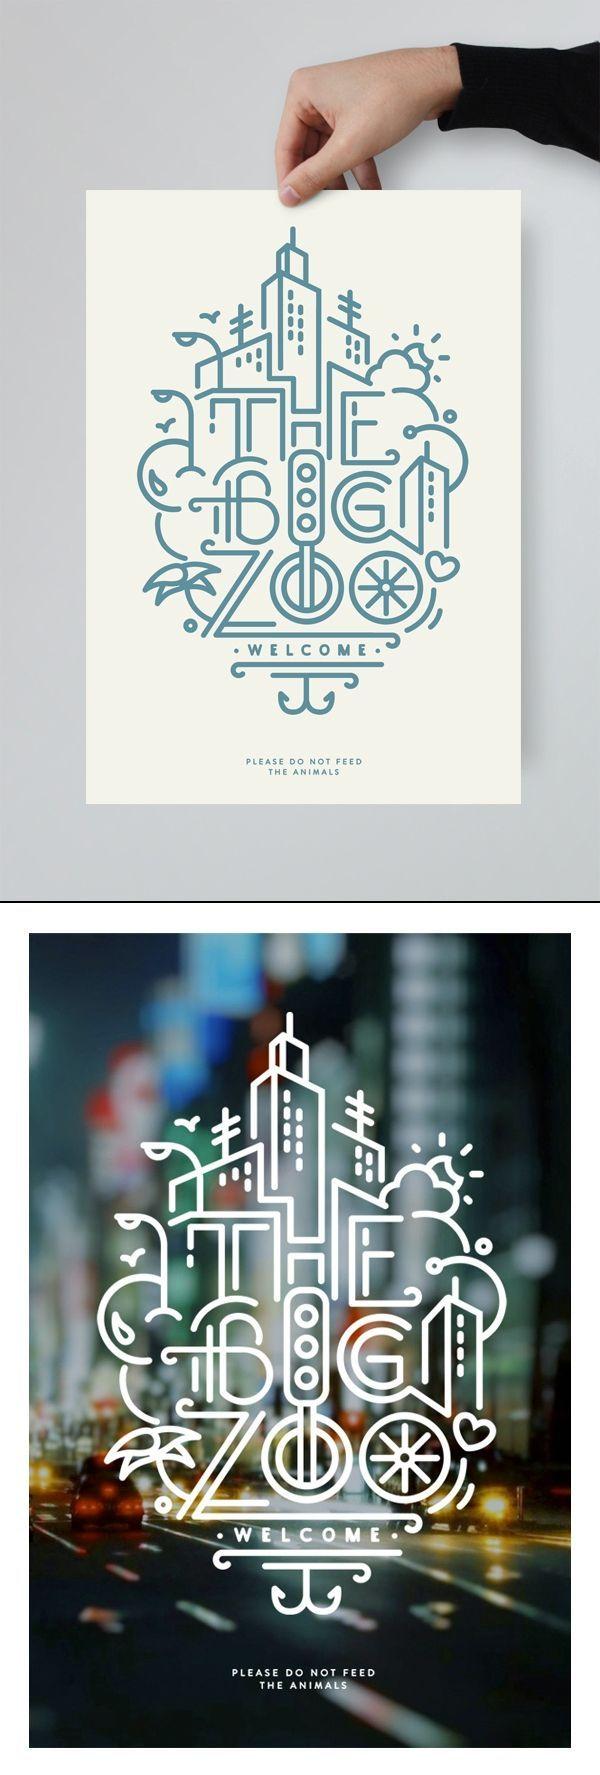 Javi Bueno→THE BIG ZOO - Graphic Design, Icon Design, Illustration http://arcreactions.com/dont-get-seo-blindsided/